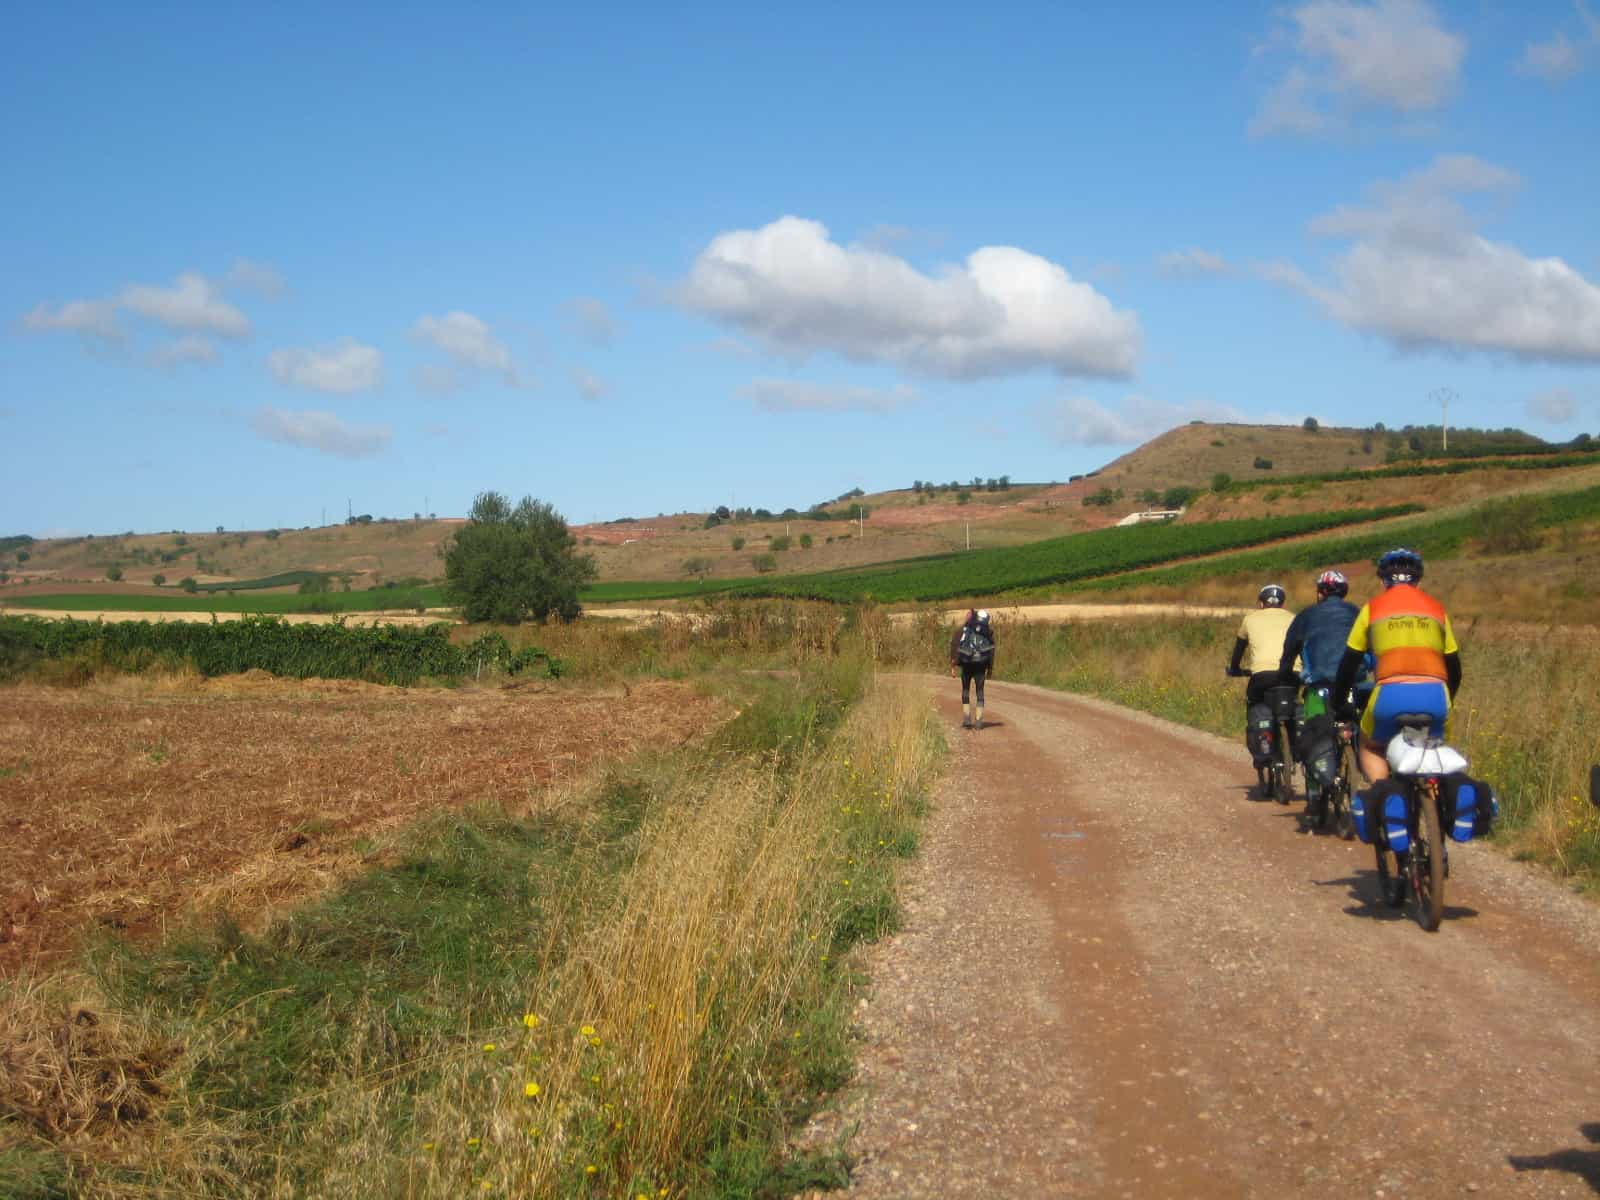 Biking the Camino